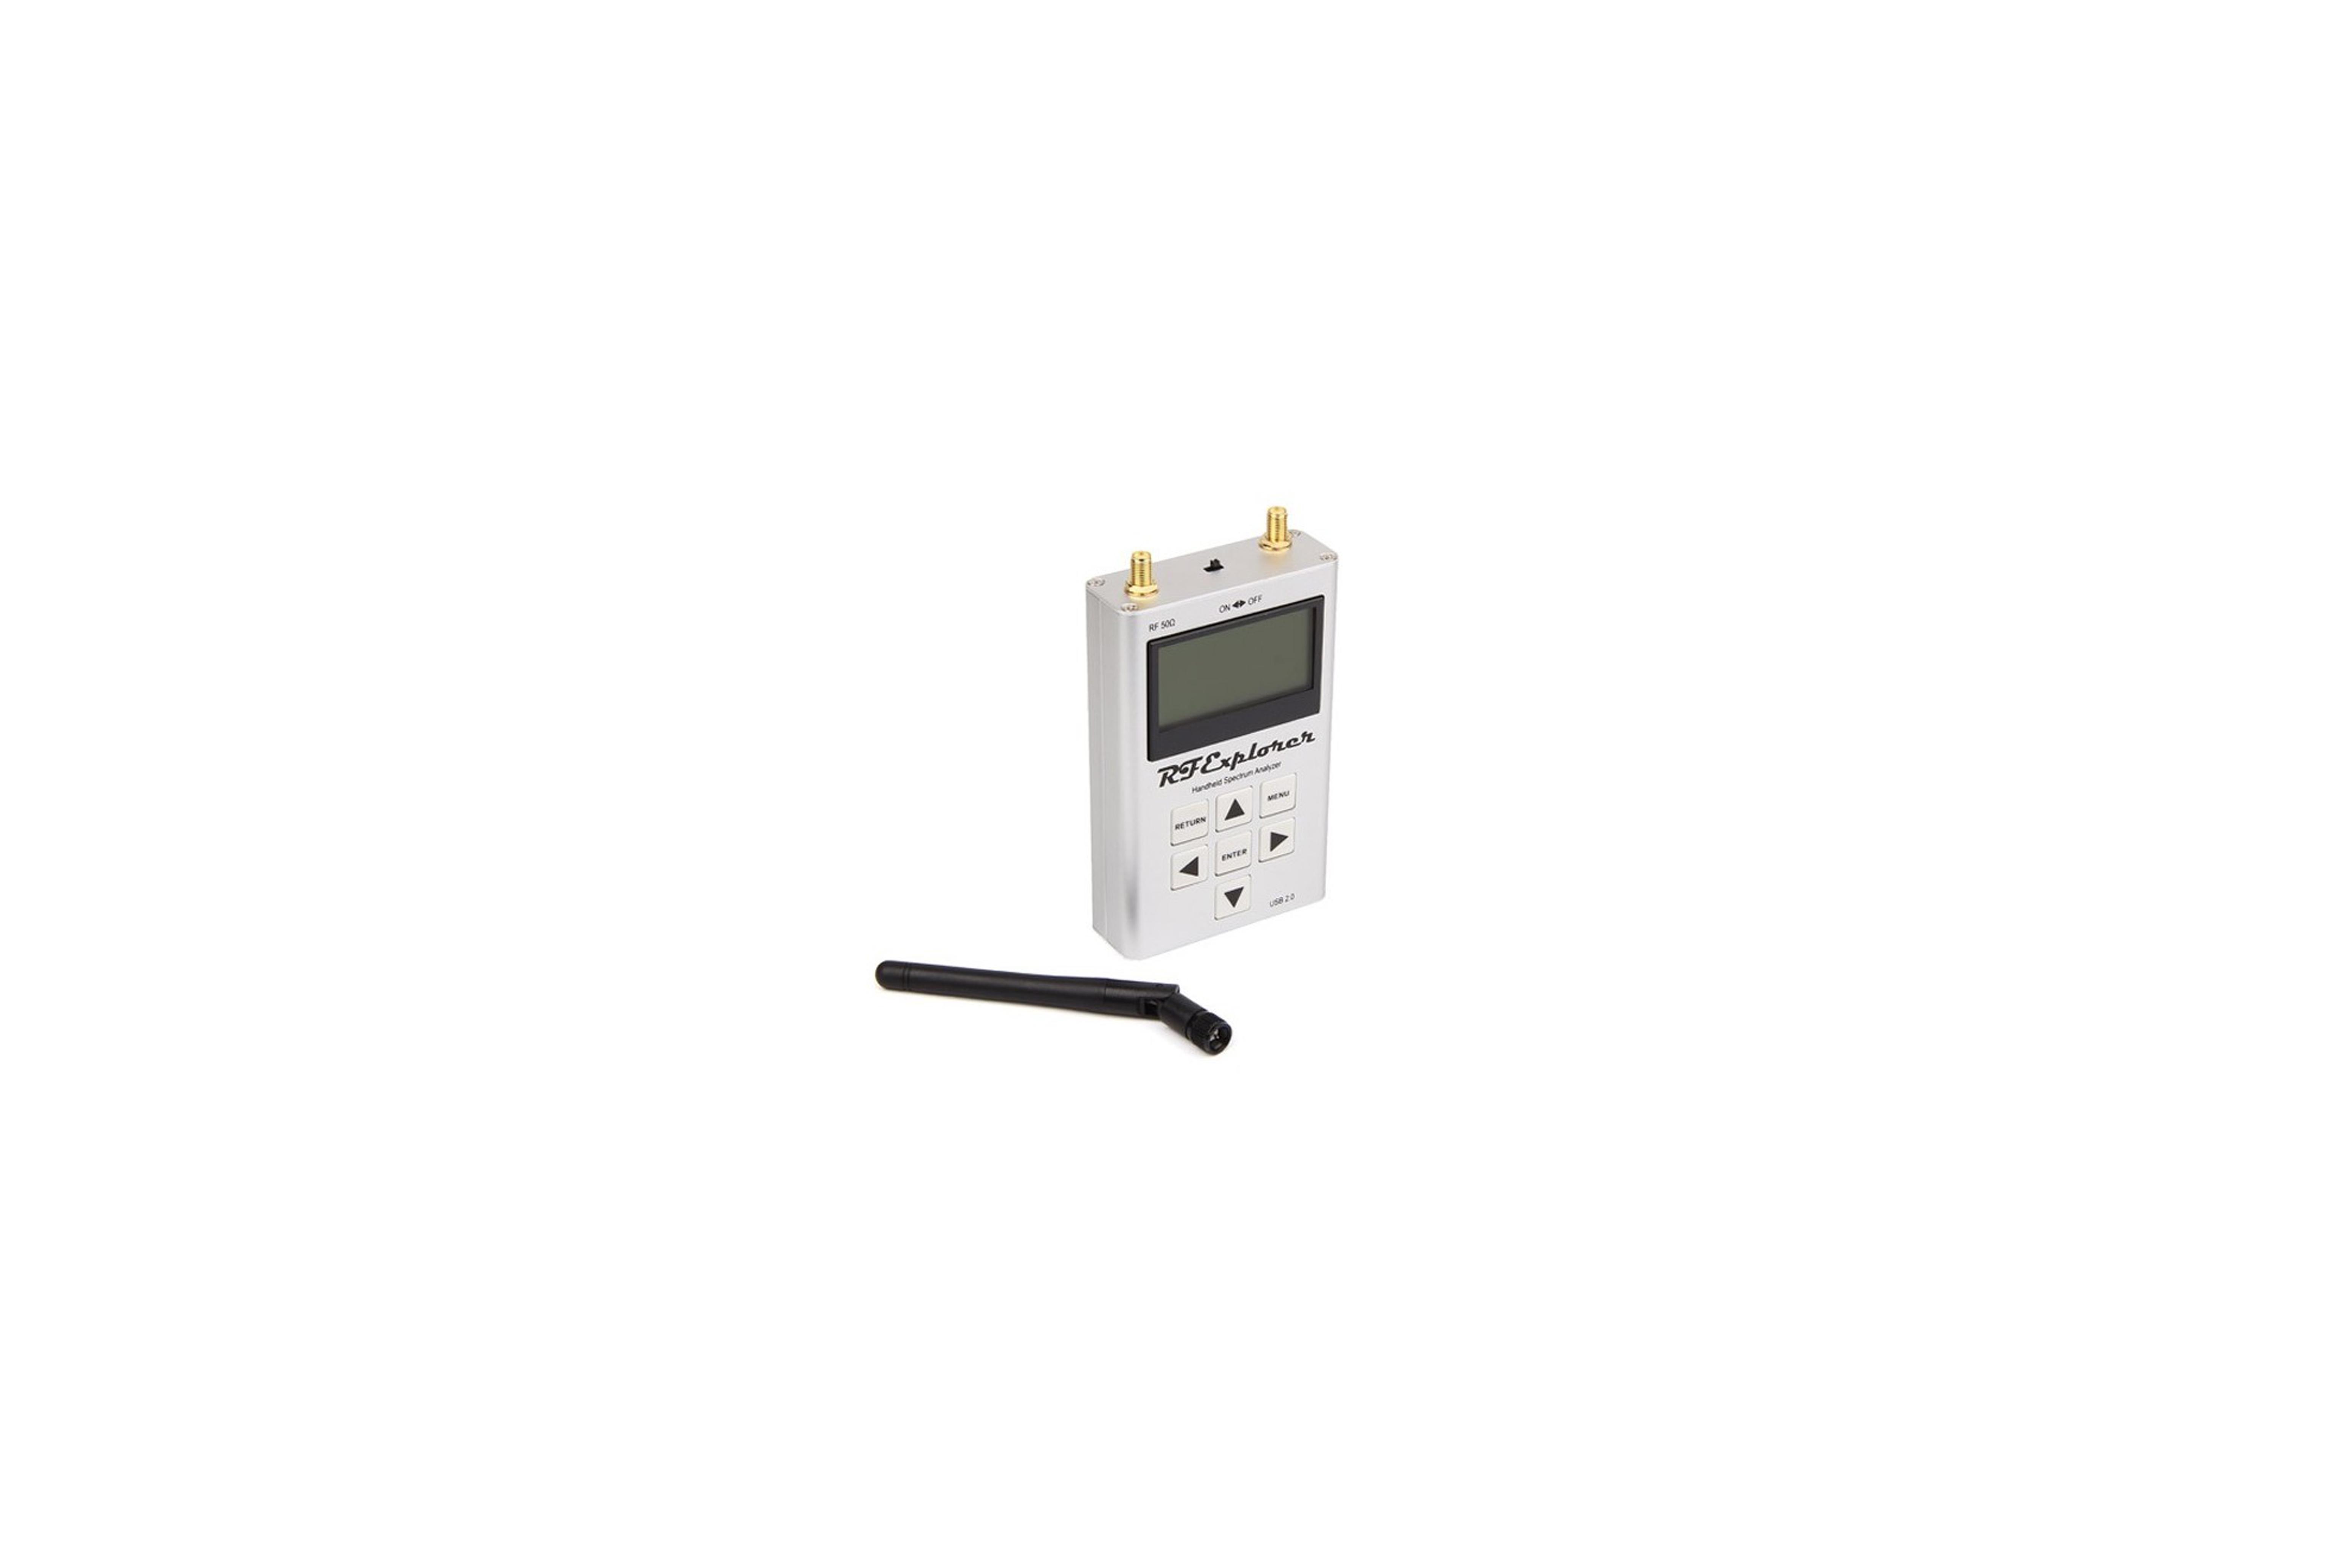 COMBINAISON SEEED RF EXPLORER 6 G,109990063